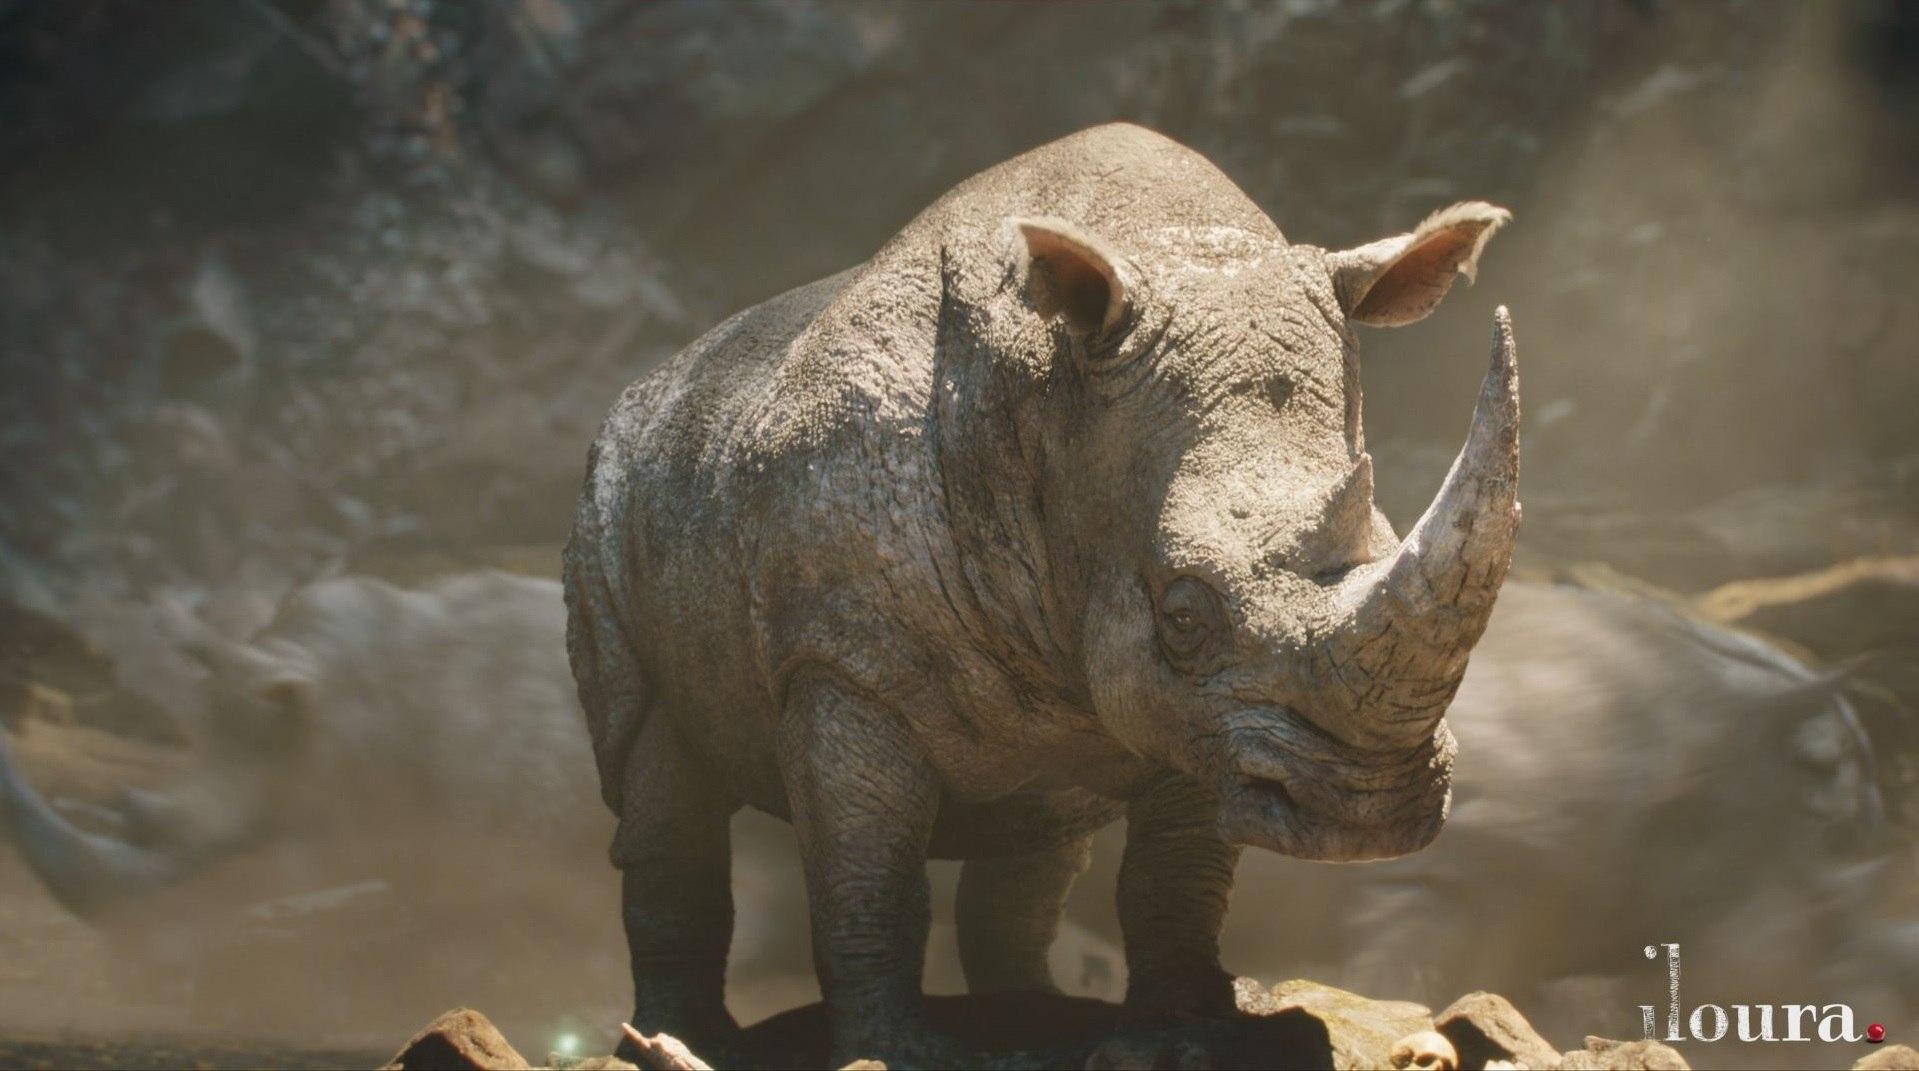 Iloura Creates Ravaging Rhinos For Jumanji Welcome To